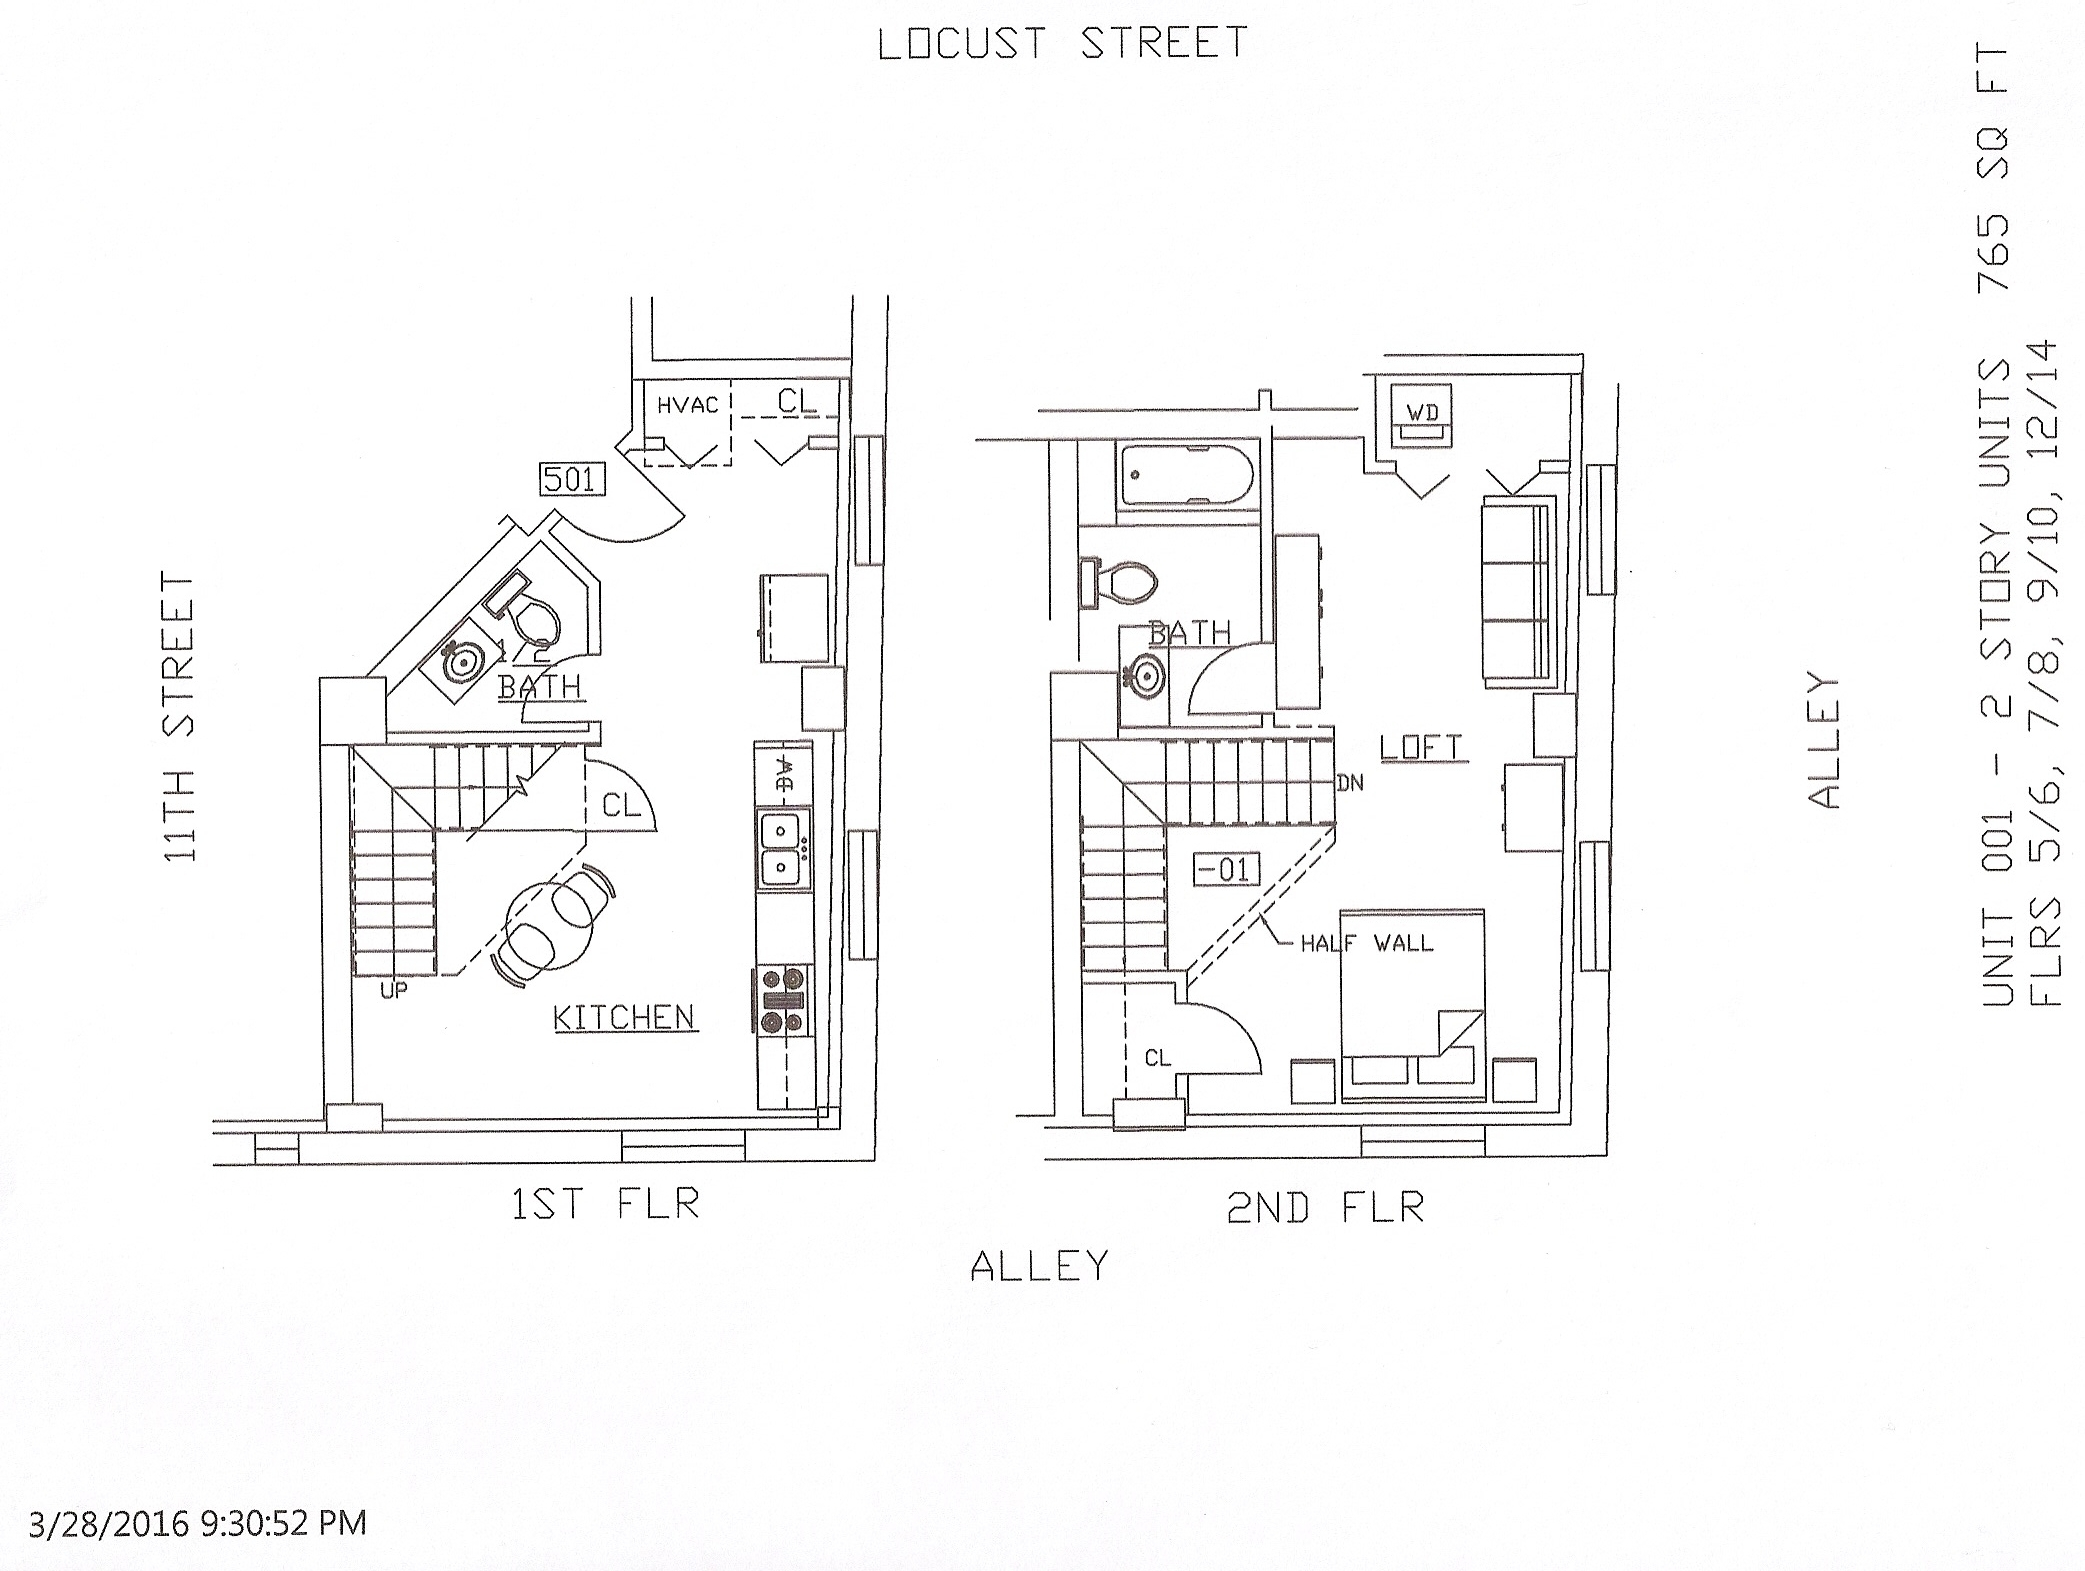 Unit 01, 765 Square Feet